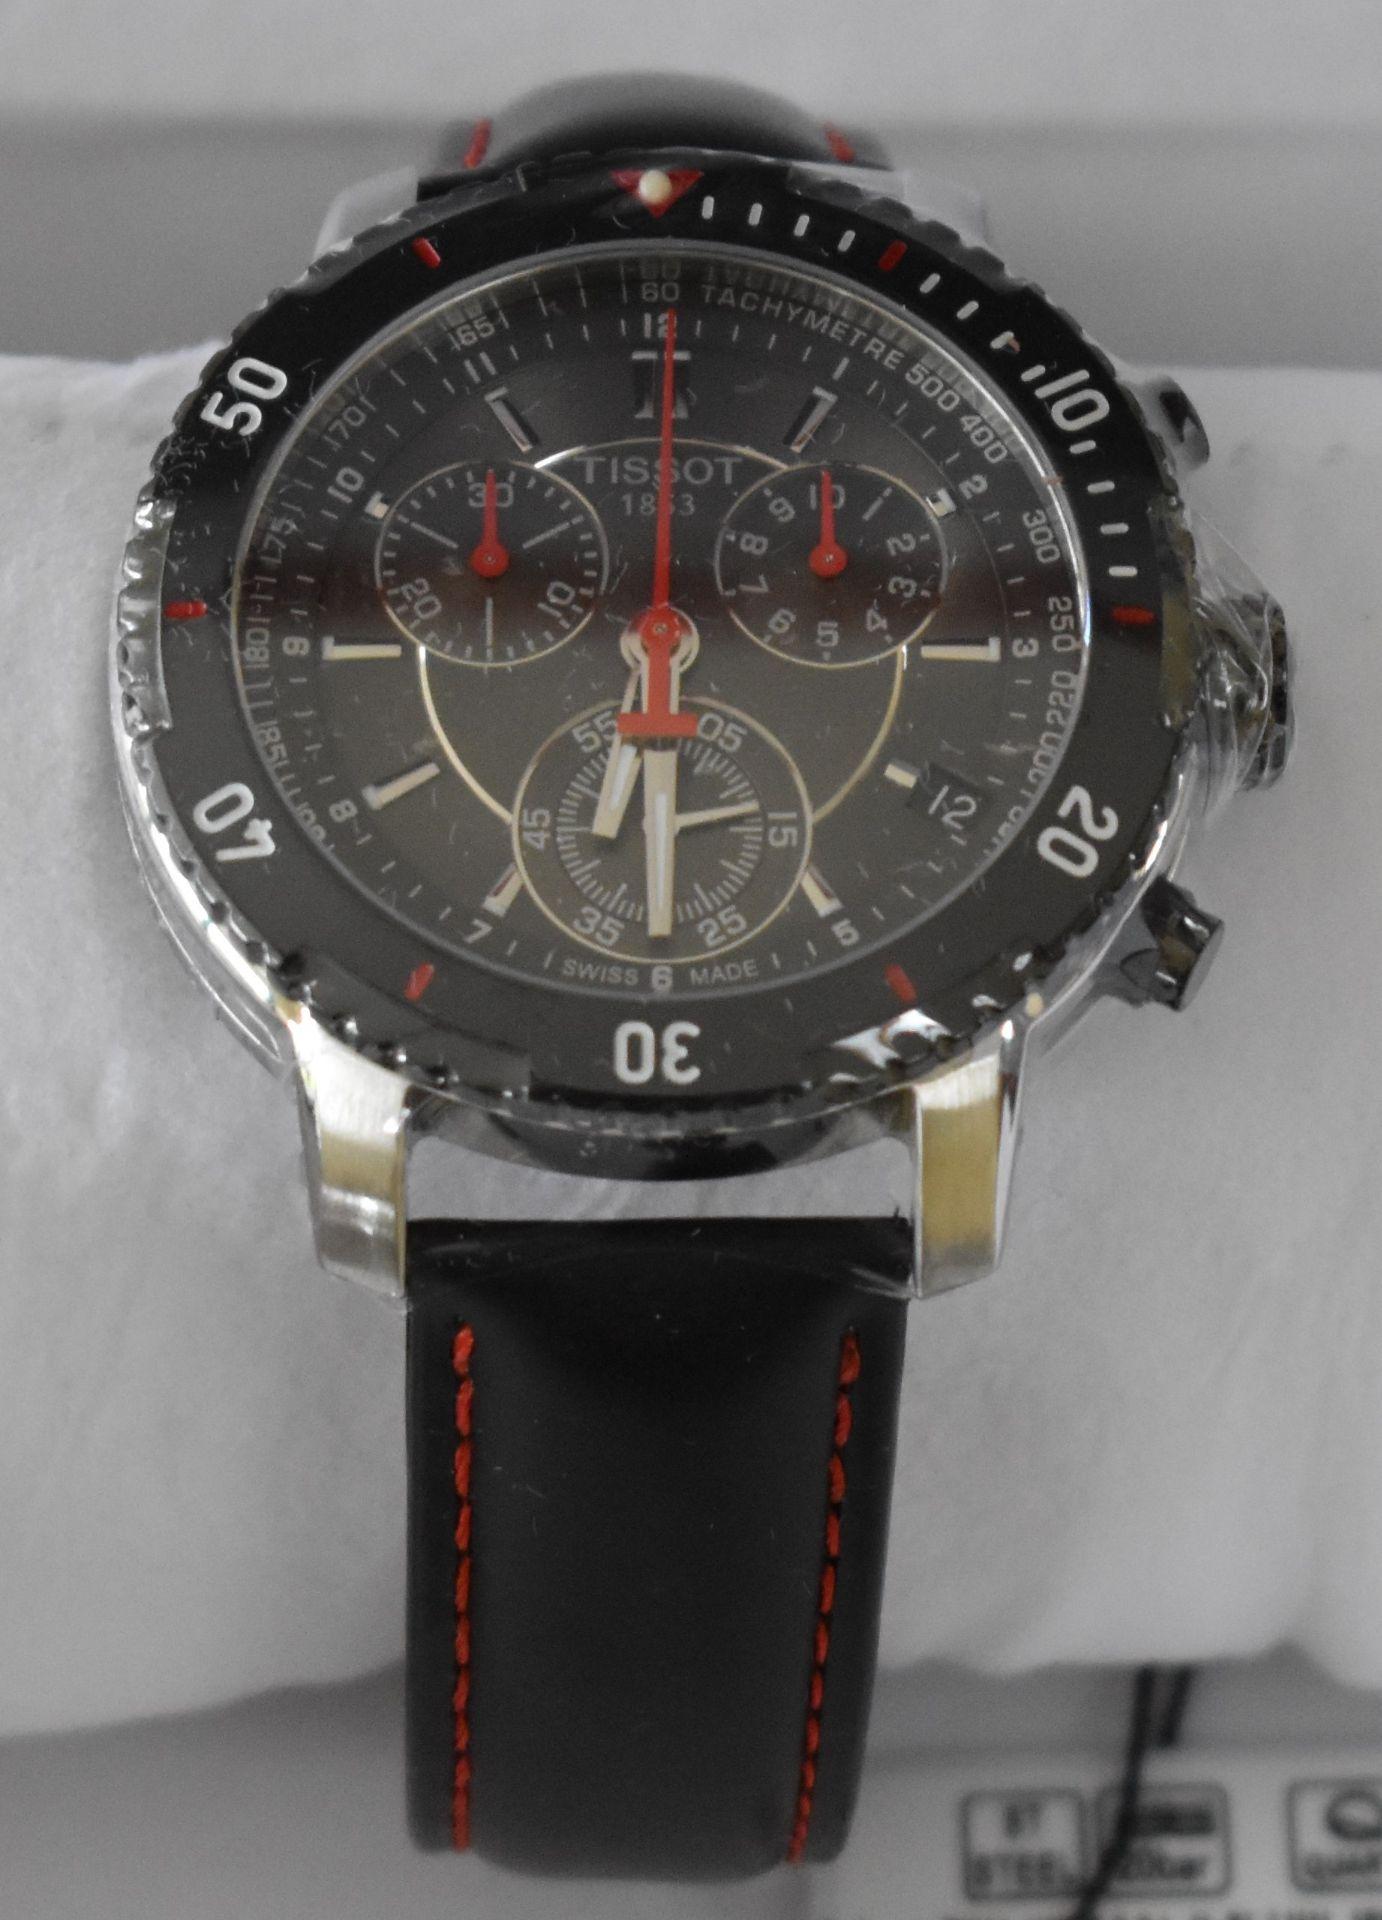 Tissot Men's watch TO67.417.26.051.00